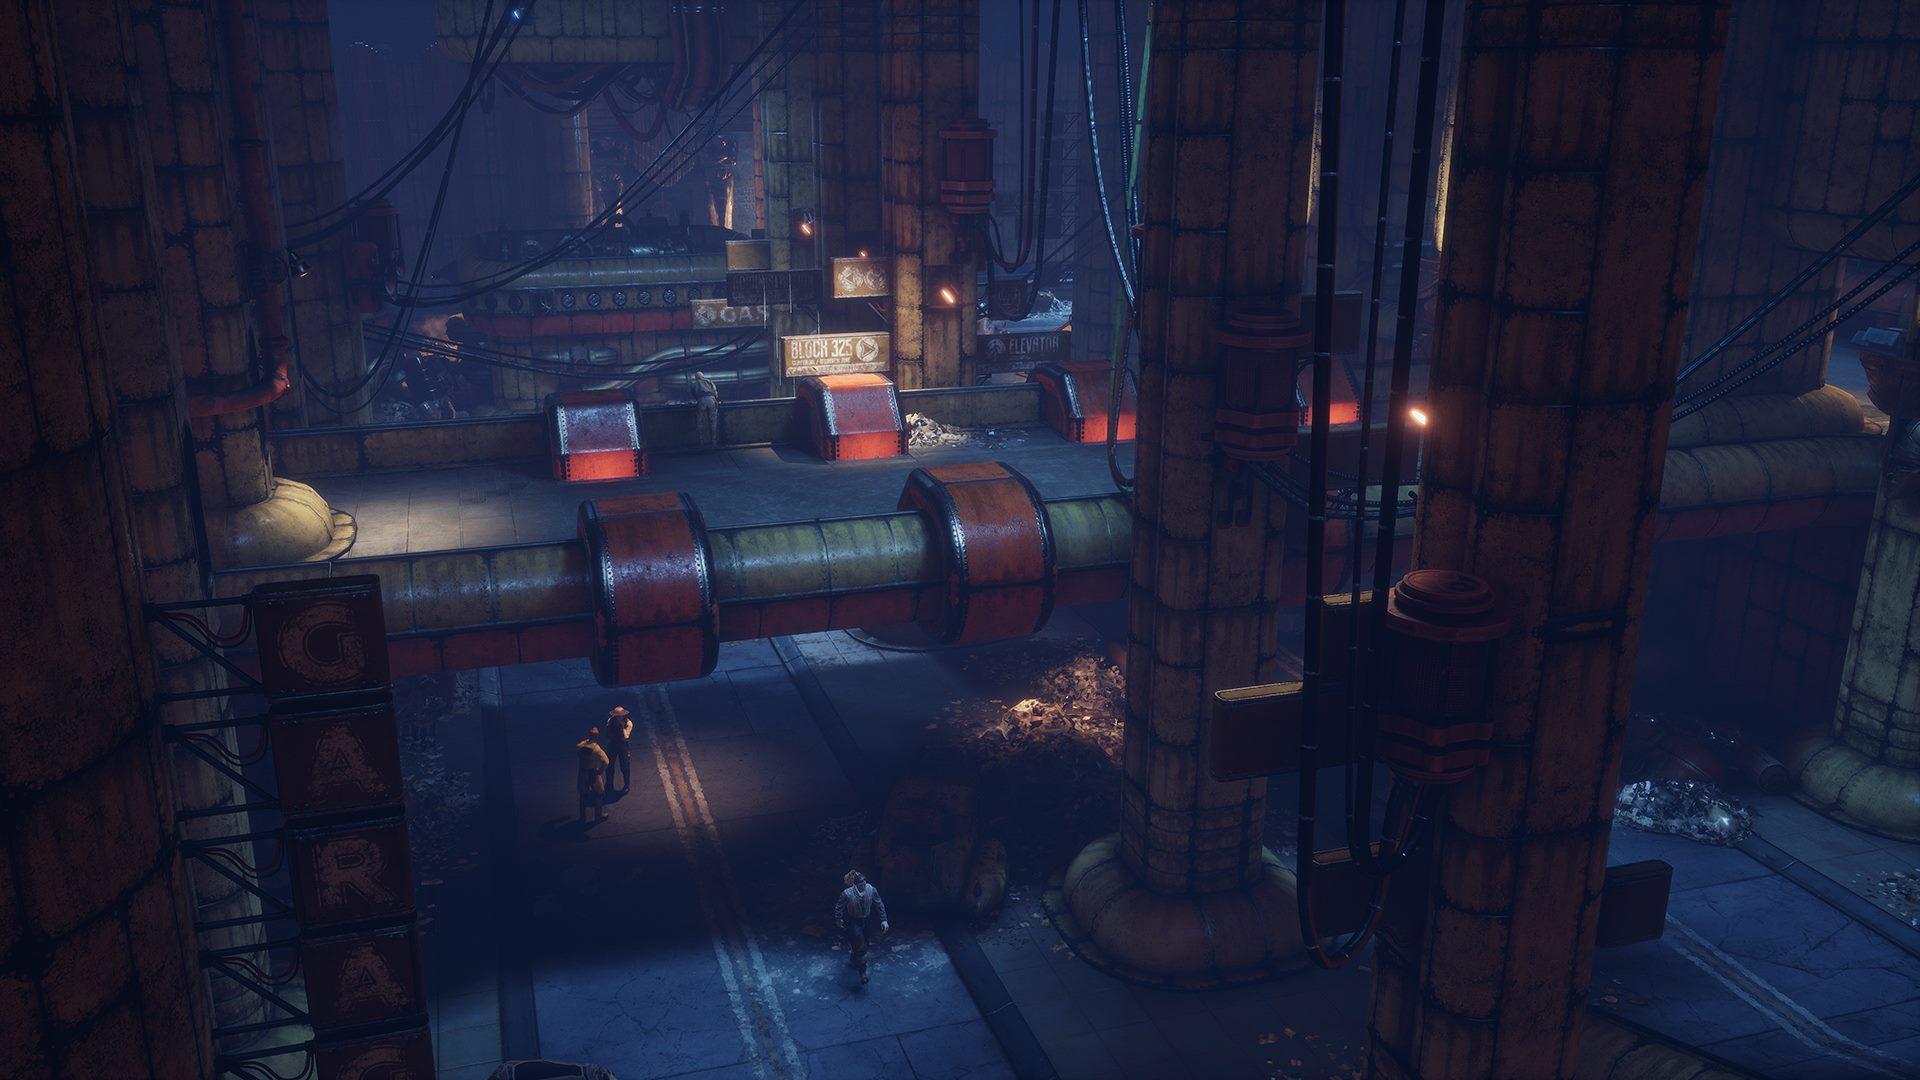 Insomnia: The Ark Screenshot 6 - Bilderquelle: HeroCraft